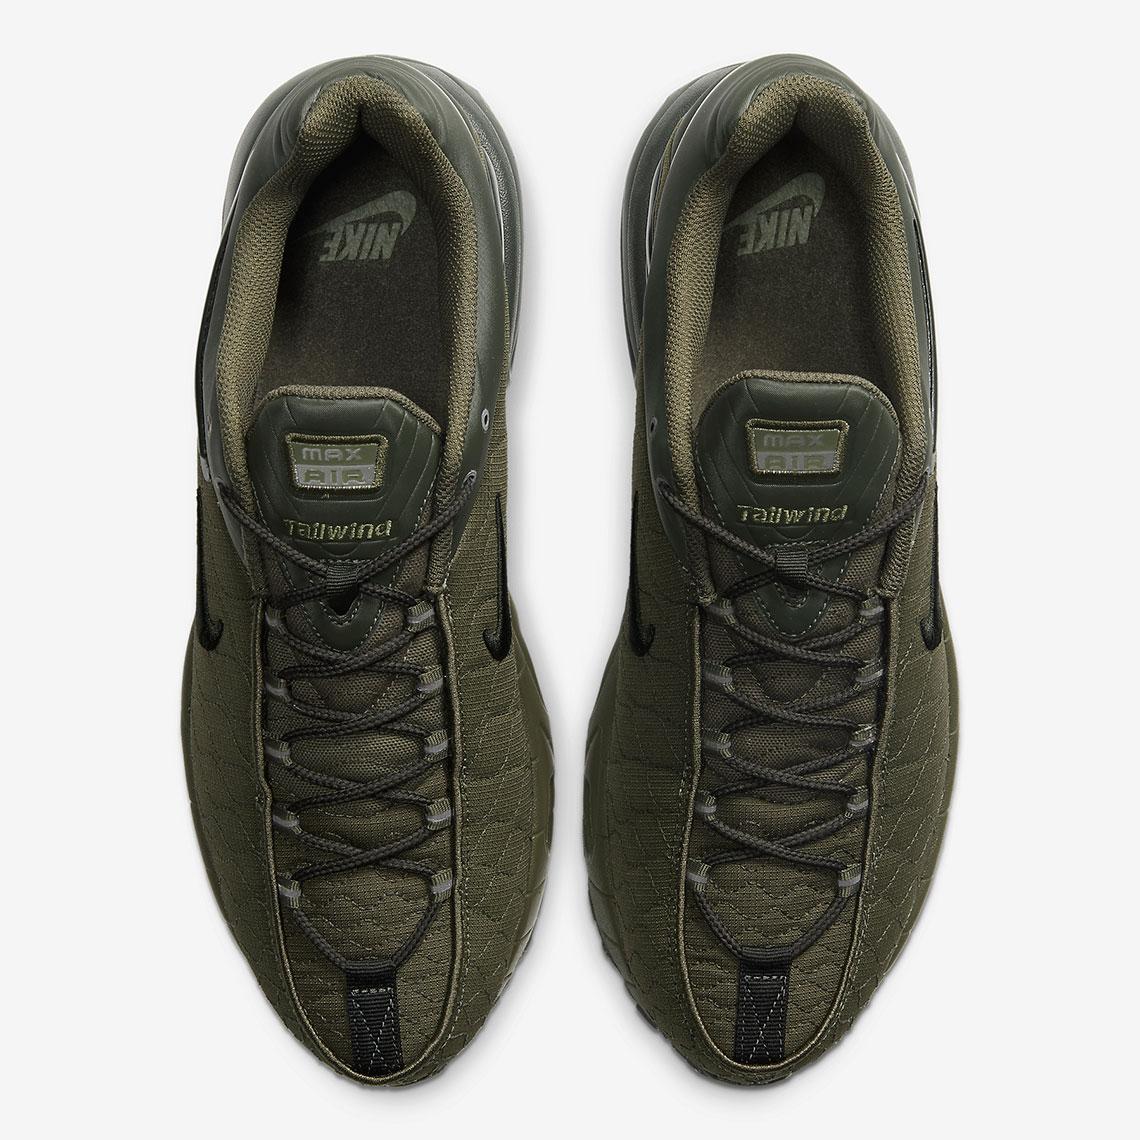 Informations sur la version Nike Air Max Tailwind 5 (V